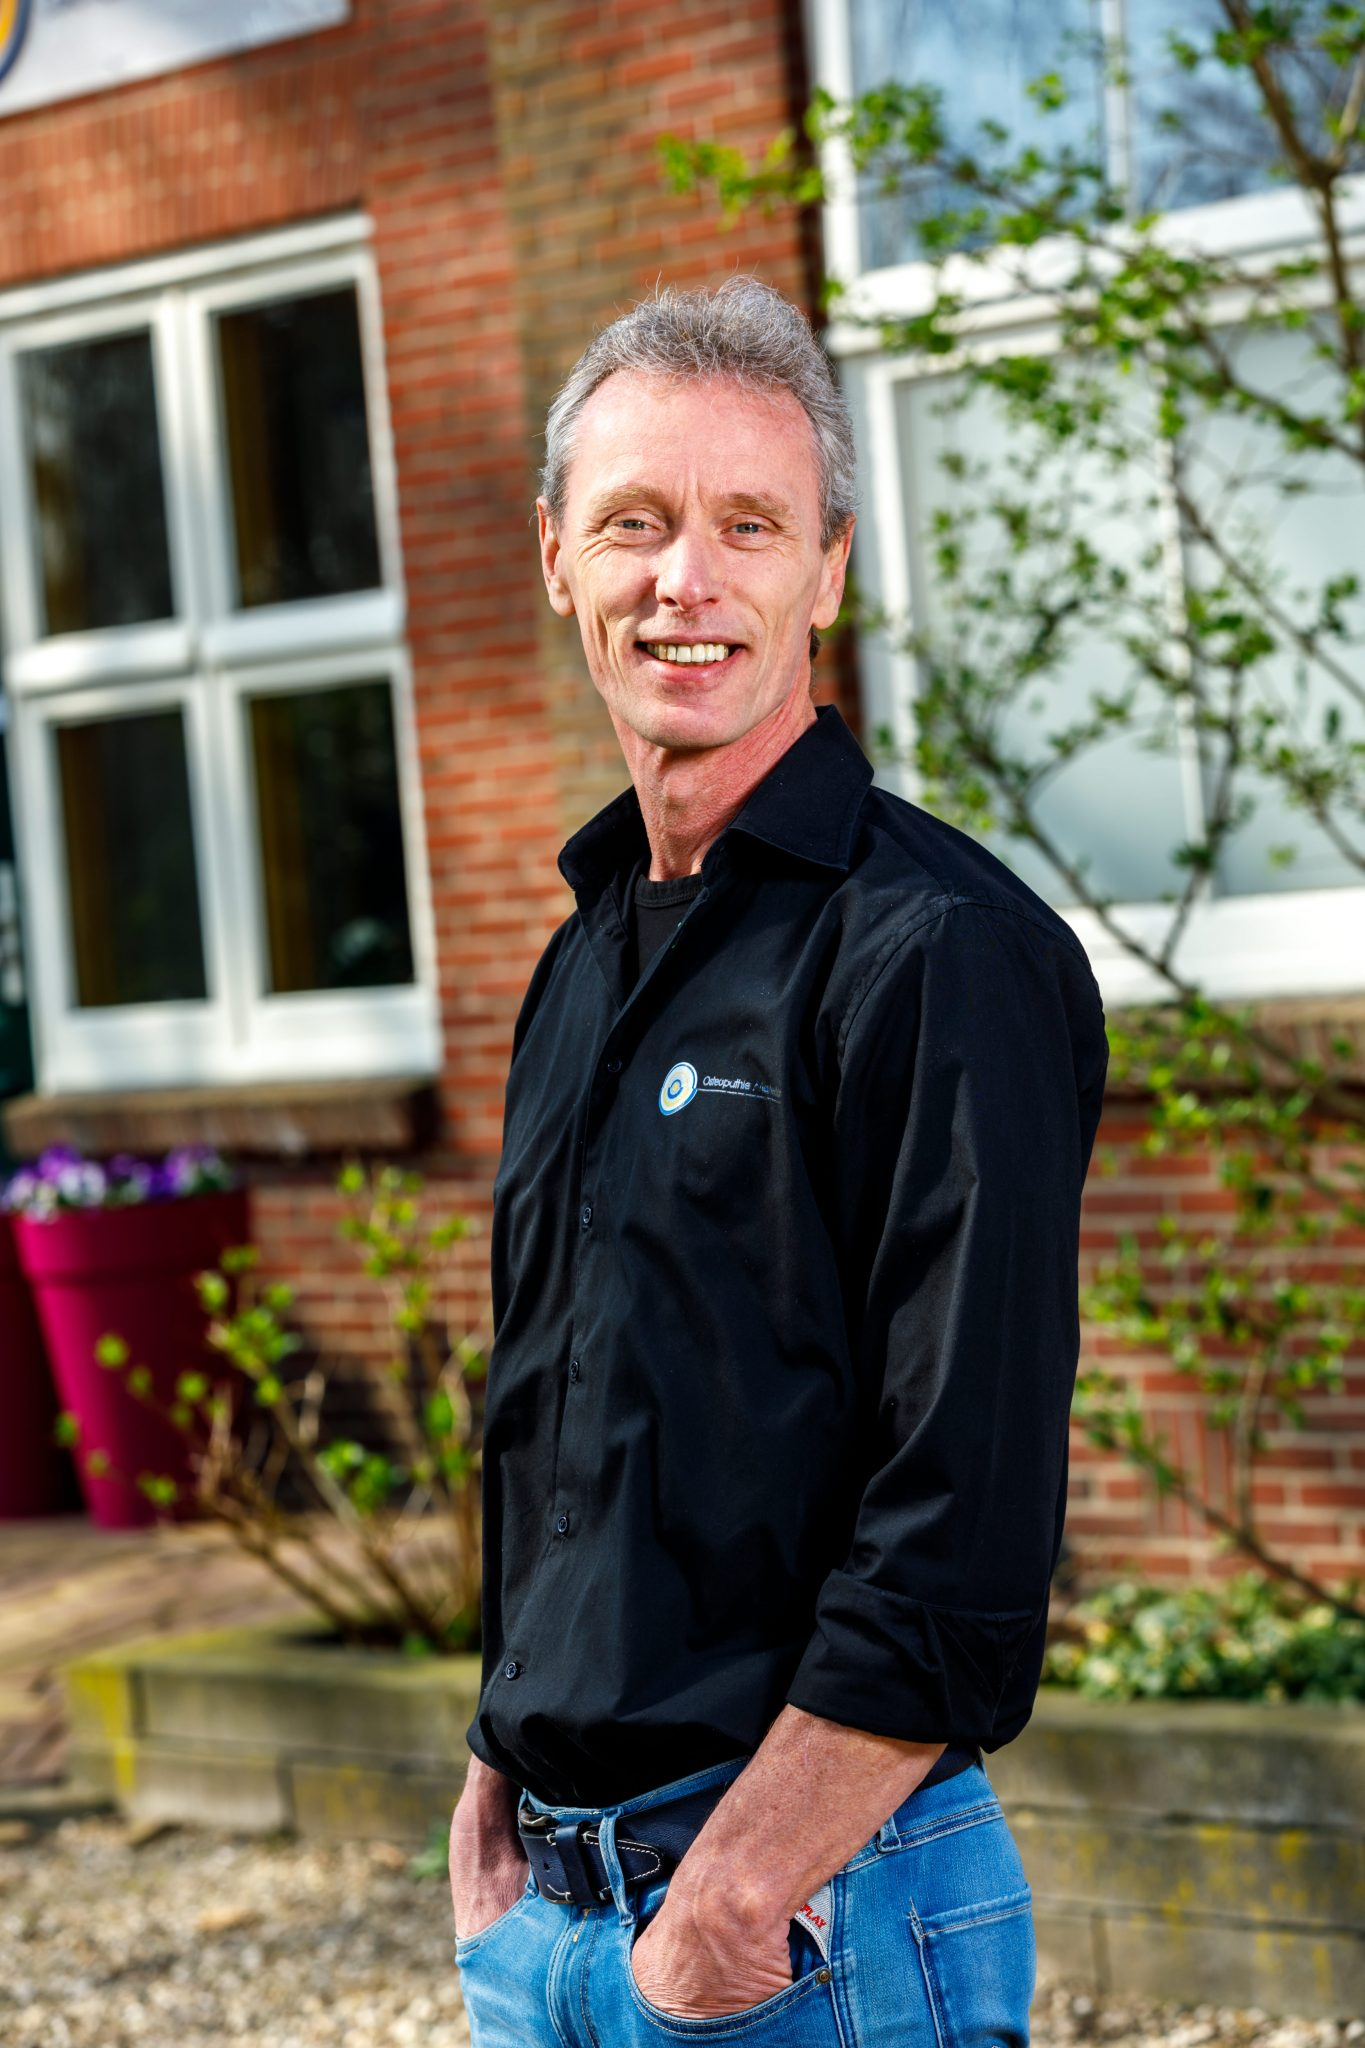 Wim Steenberg